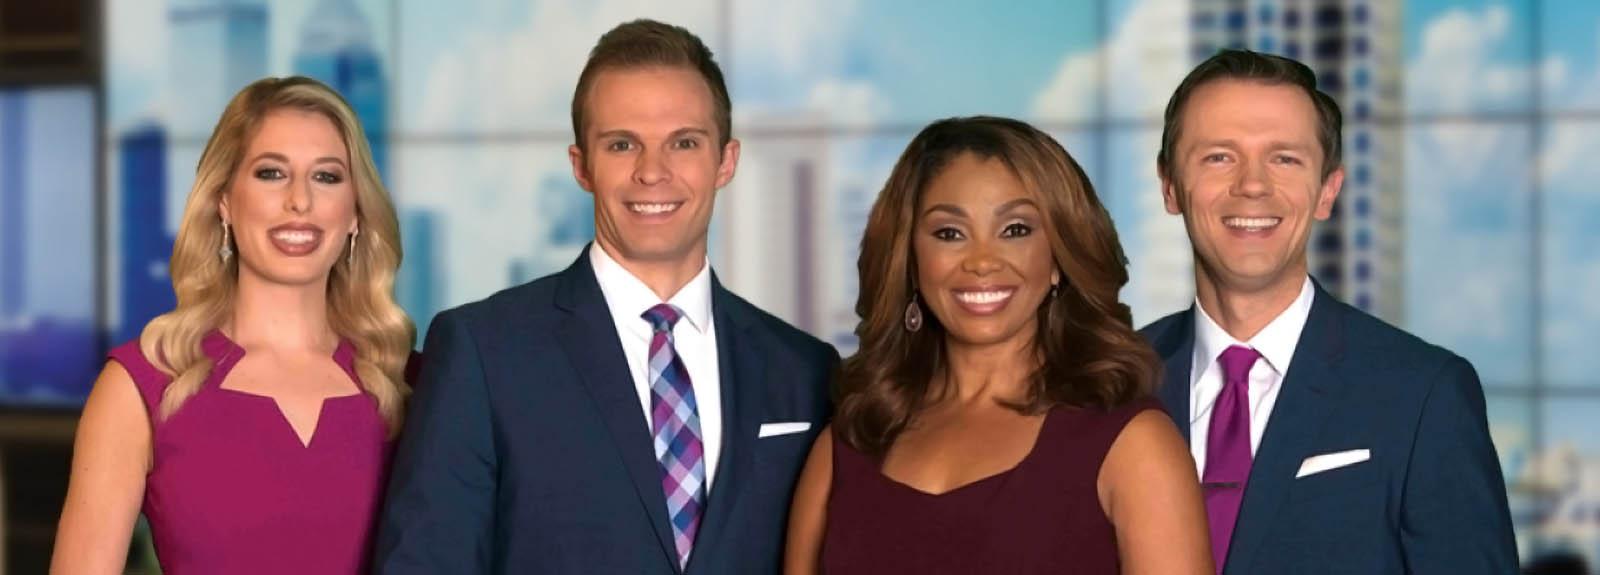 ABC Action News Tampa Good Morning Tampa Bay team